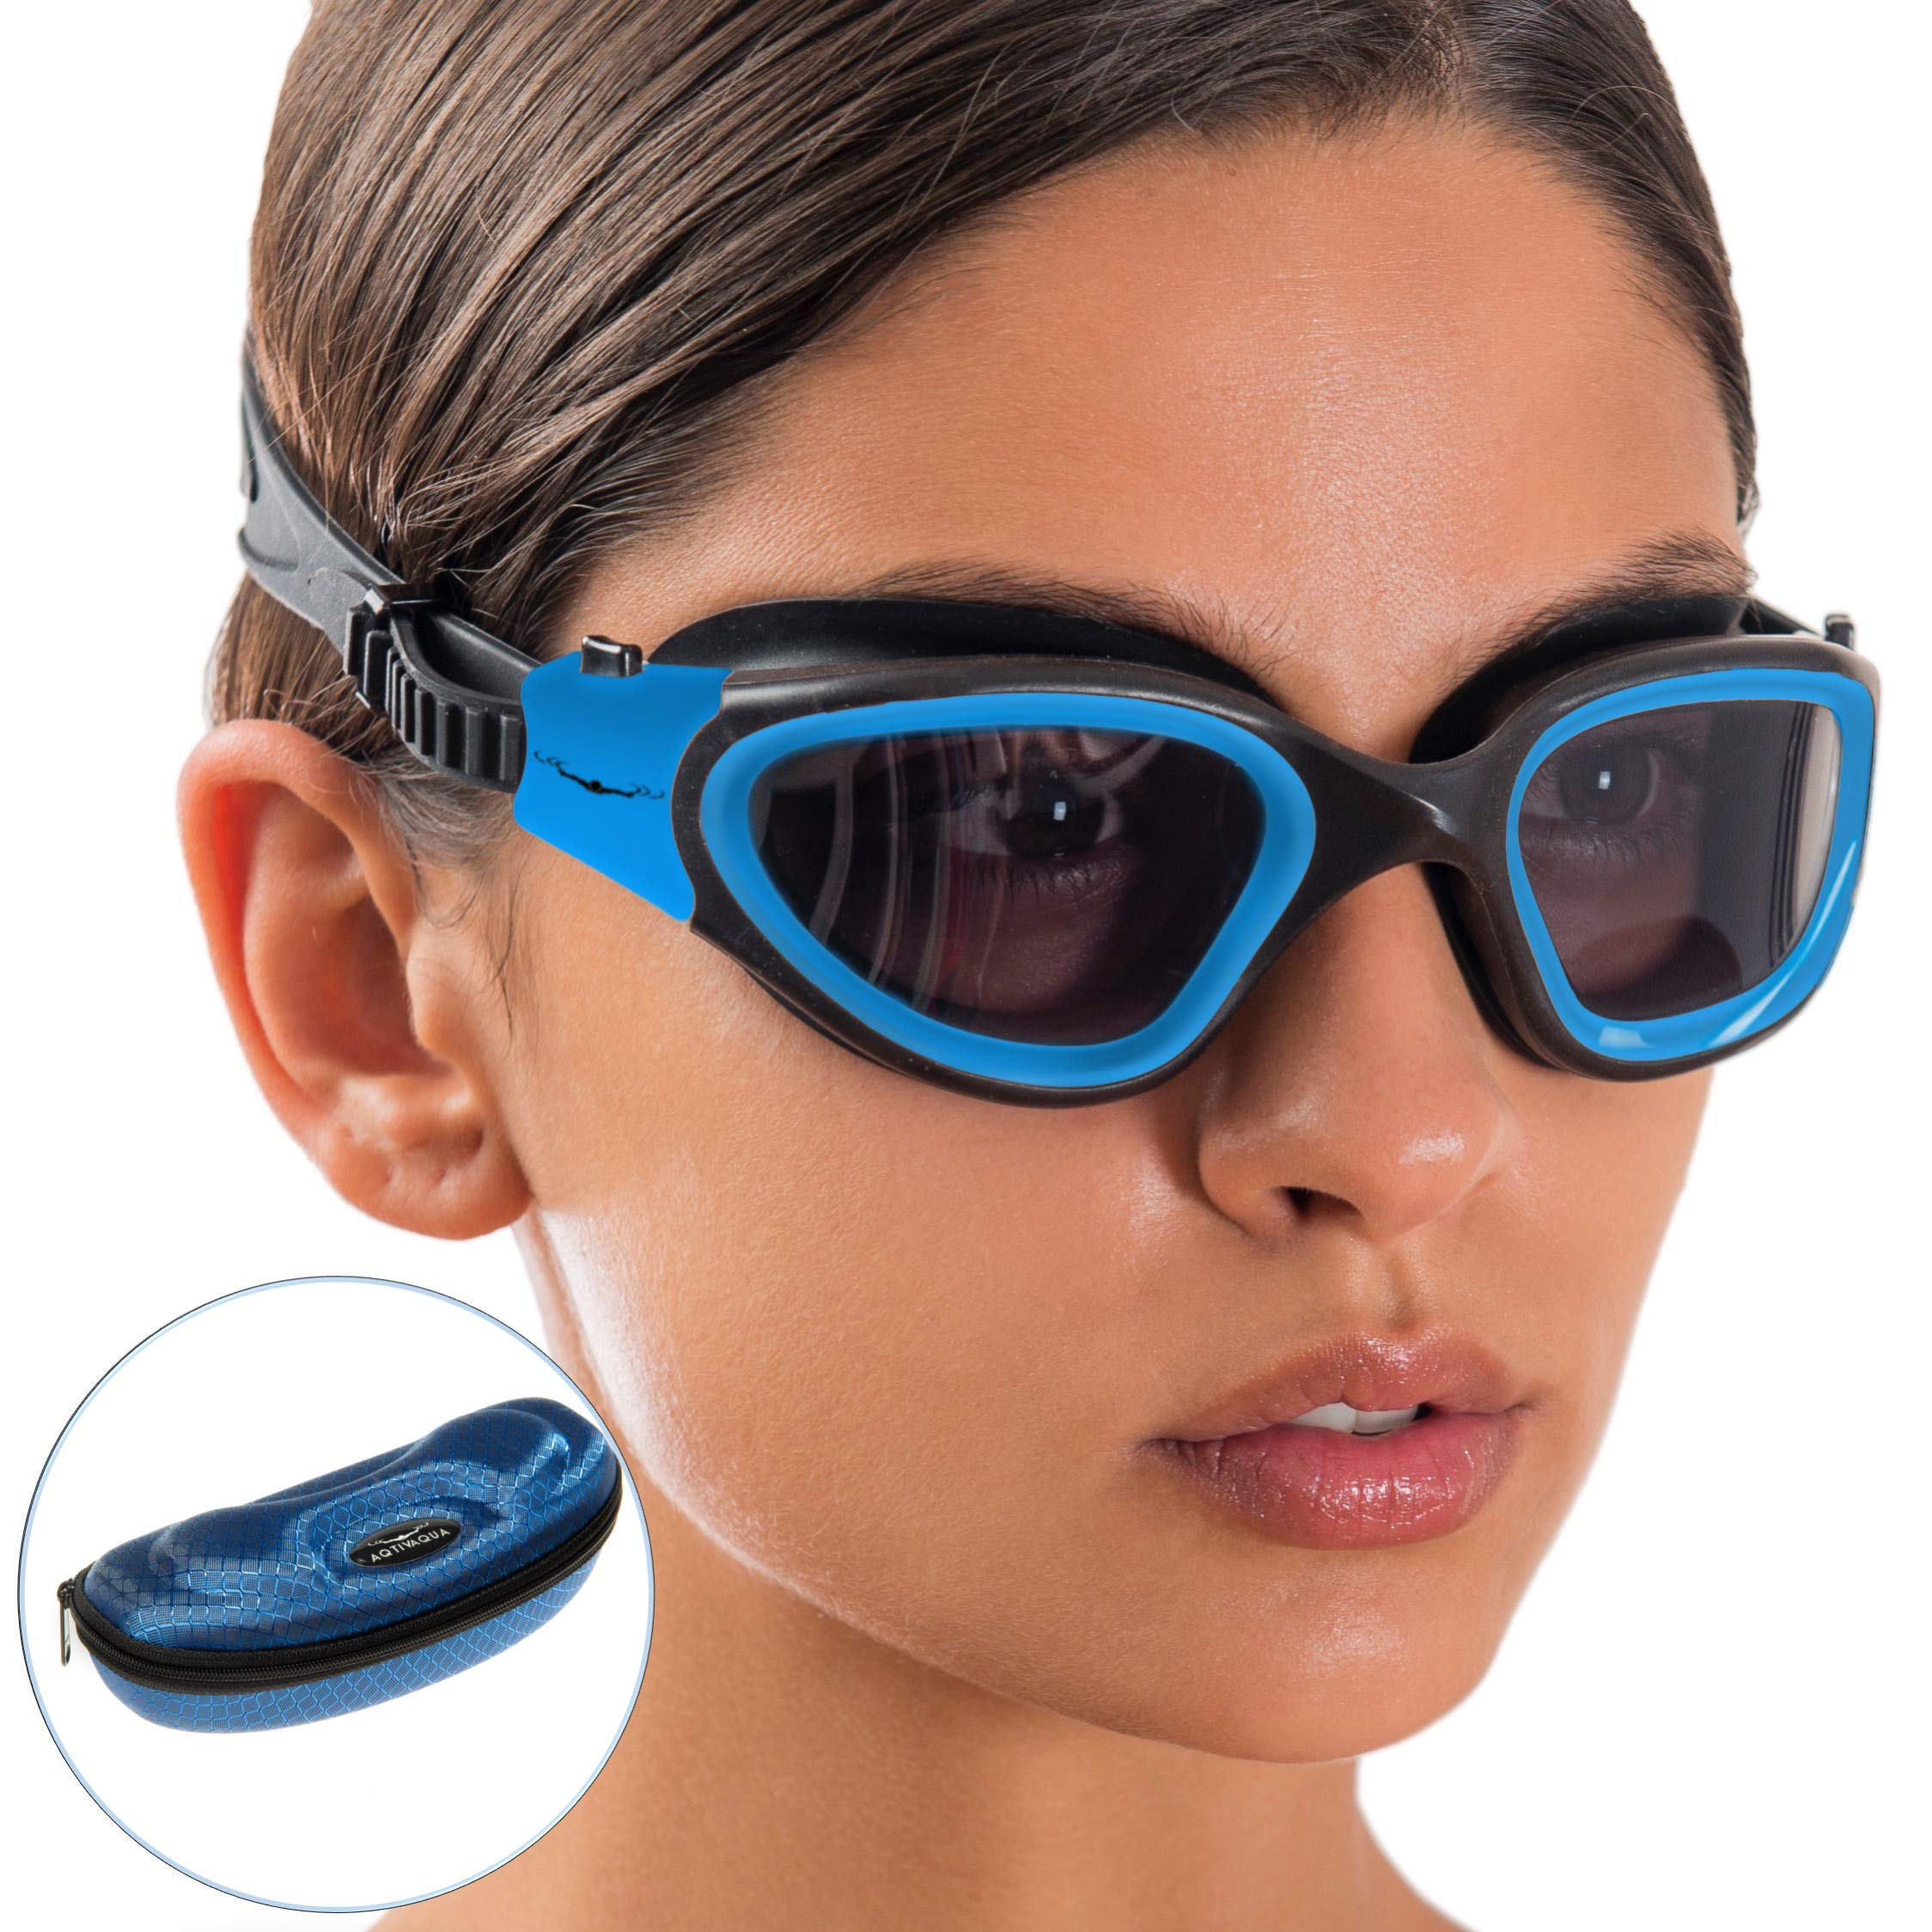 AqtivAqua Goggles Swimming Adult Women